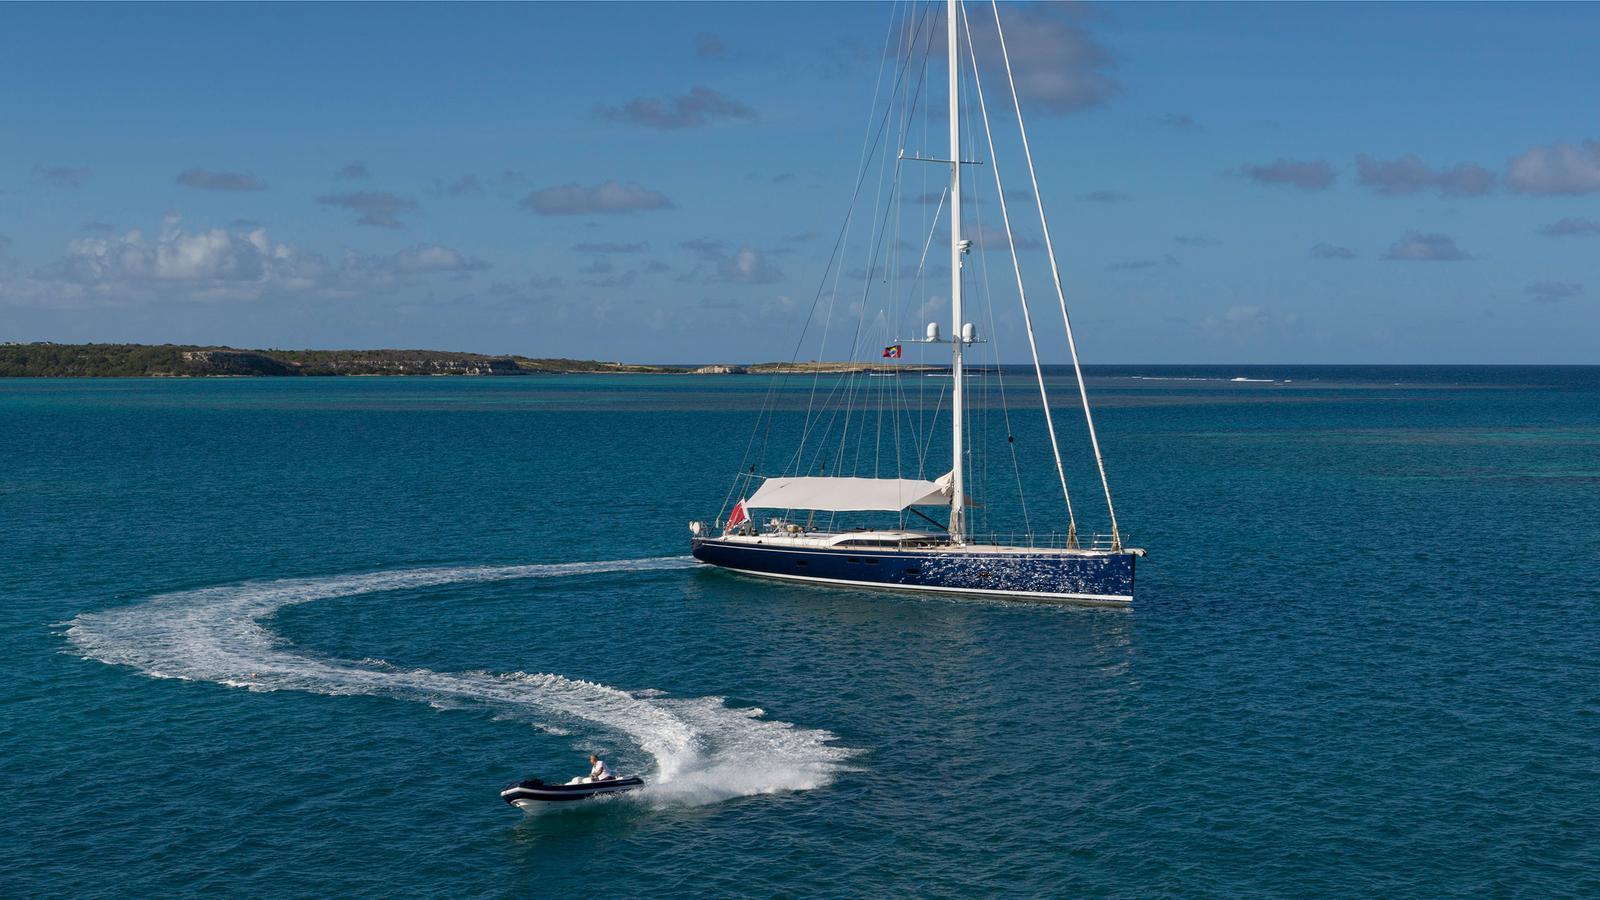 farfalla-sailing-yacht-southern-wind-2014-32m-profile-tender